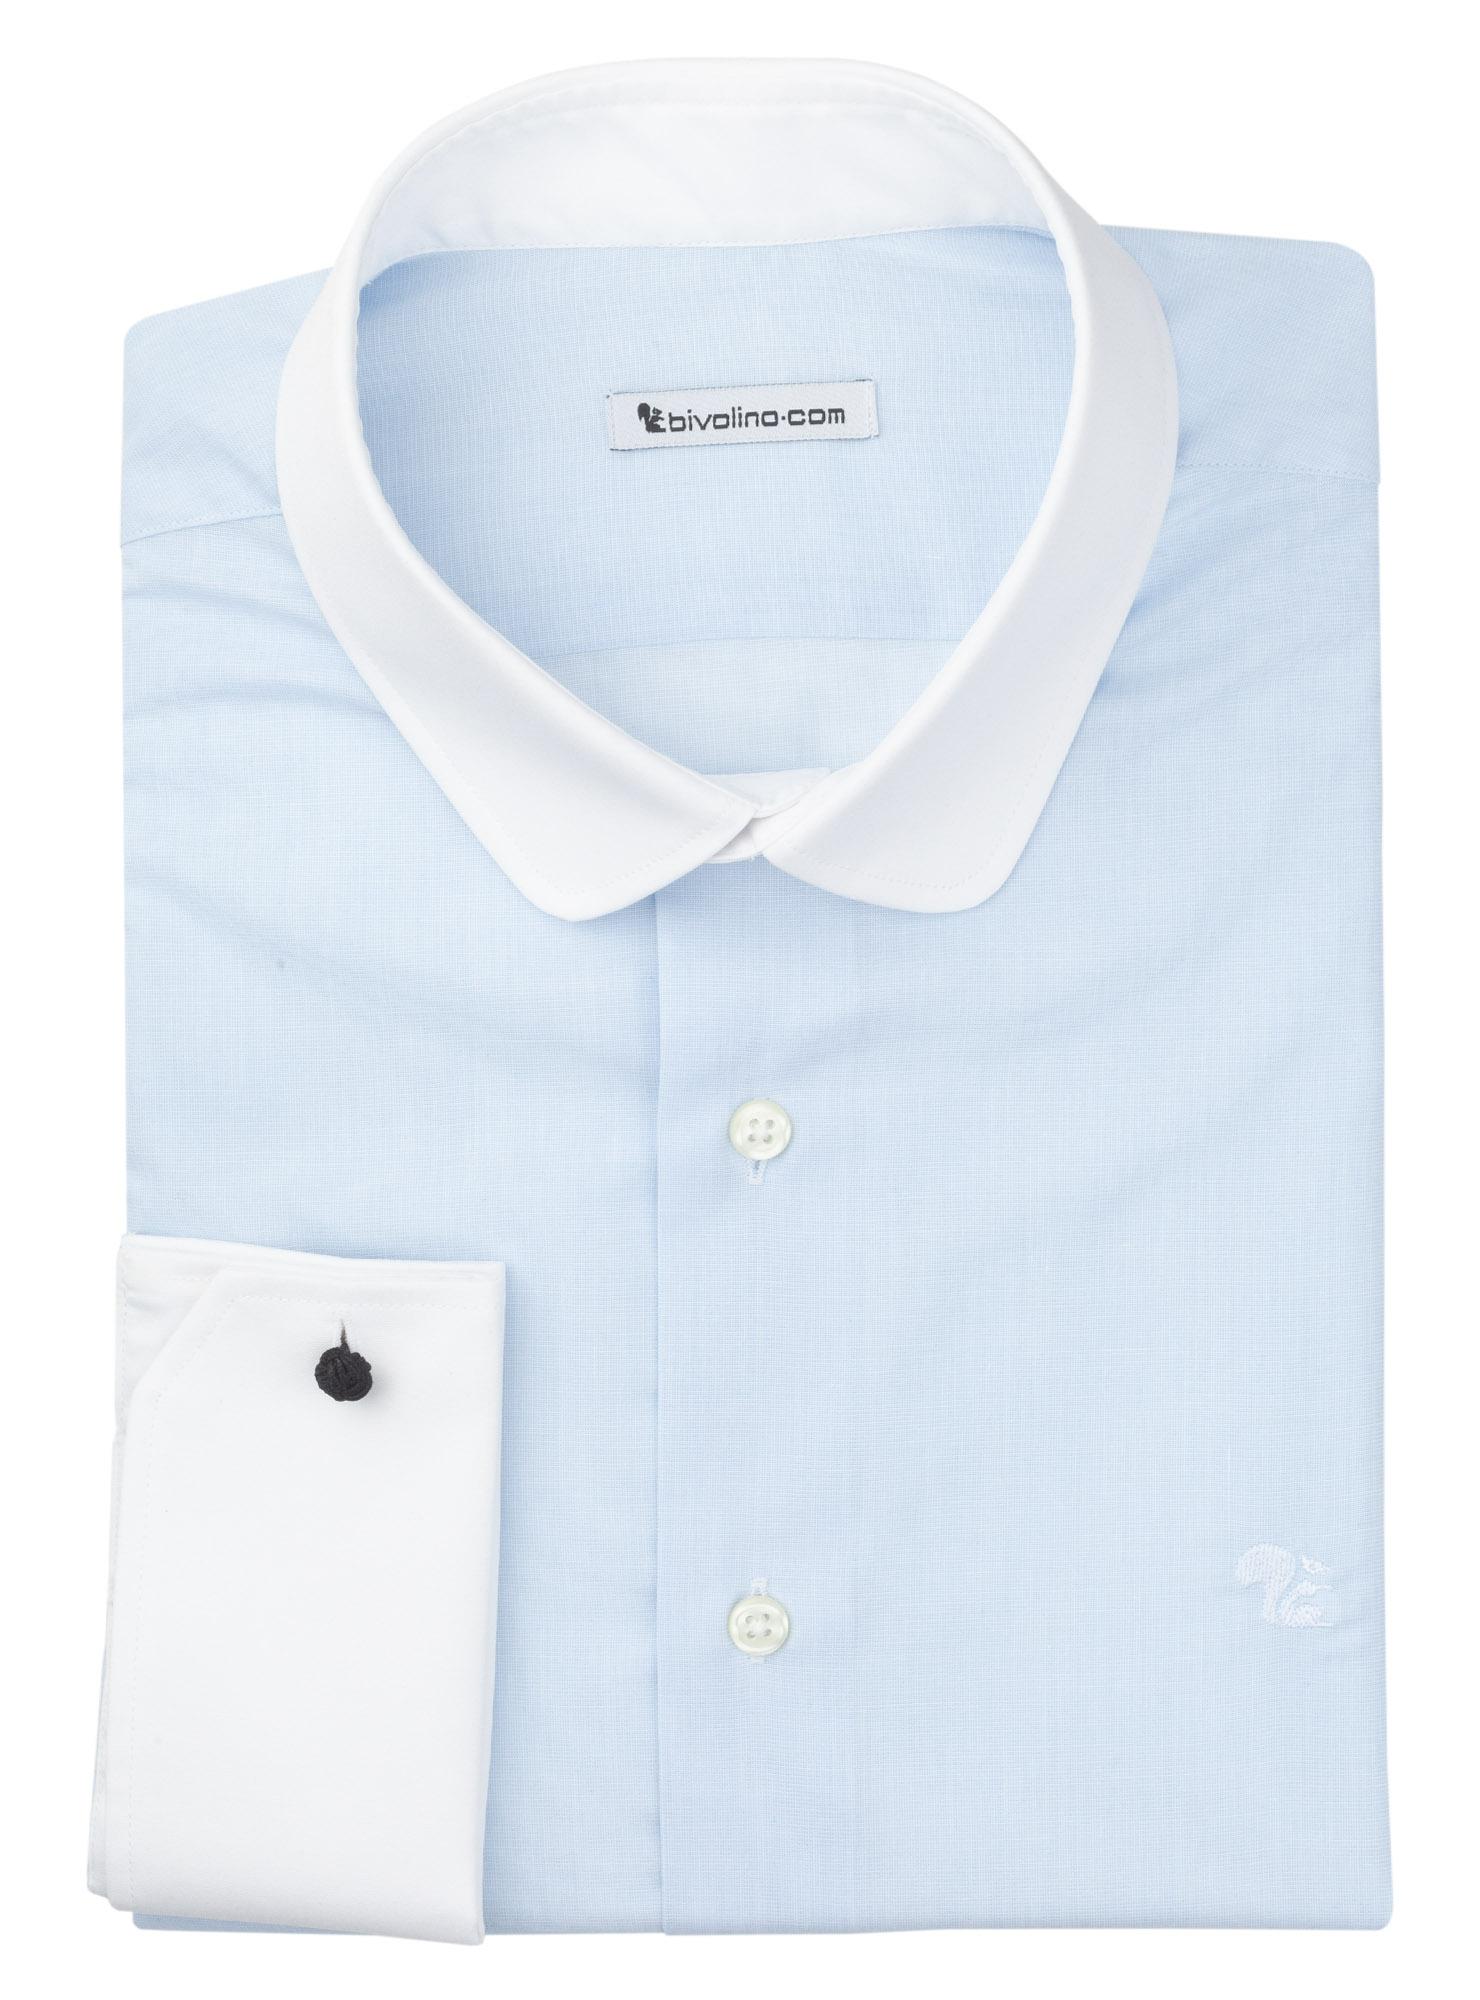 BELLUNO - Uni faden-an-faden blau baumwolle WINCHESTER Herren Hemd - Spira 3